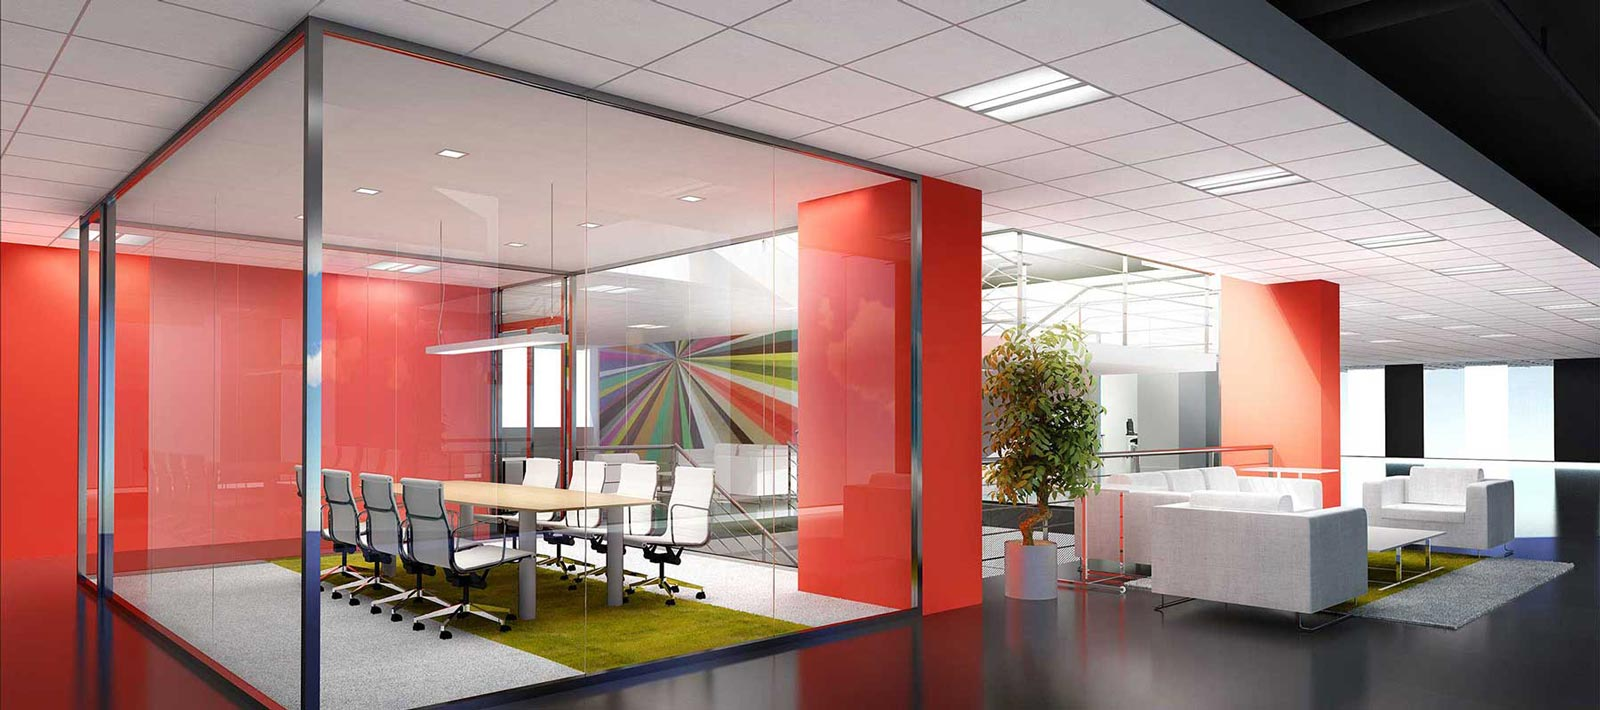 FVR_officelobbyconferenceroom